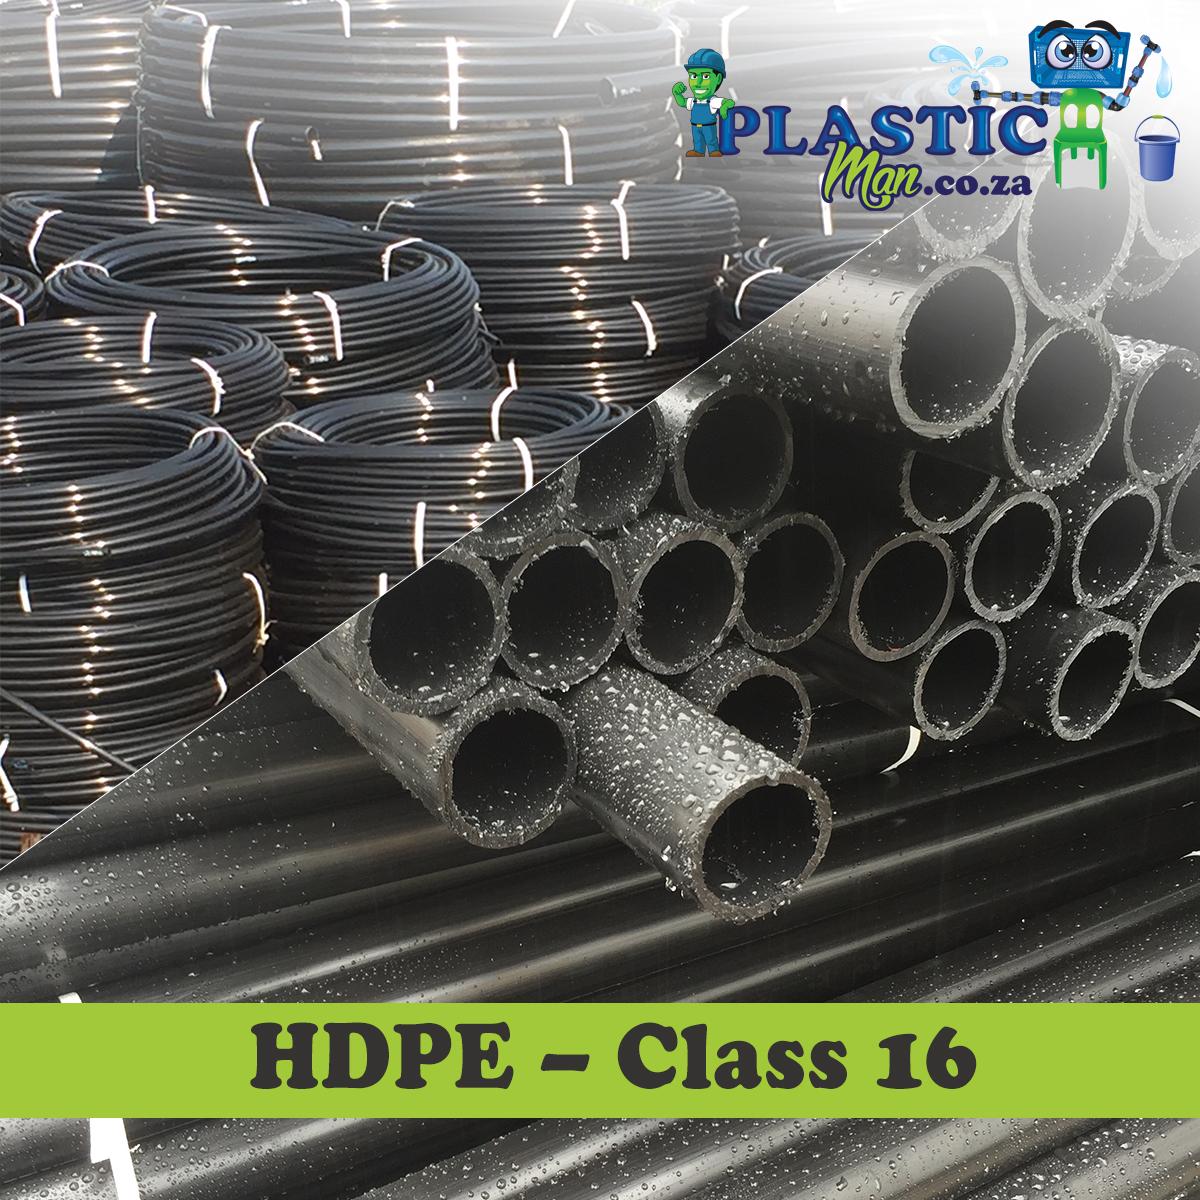 Plasticman HDPE Class 16 Pipe